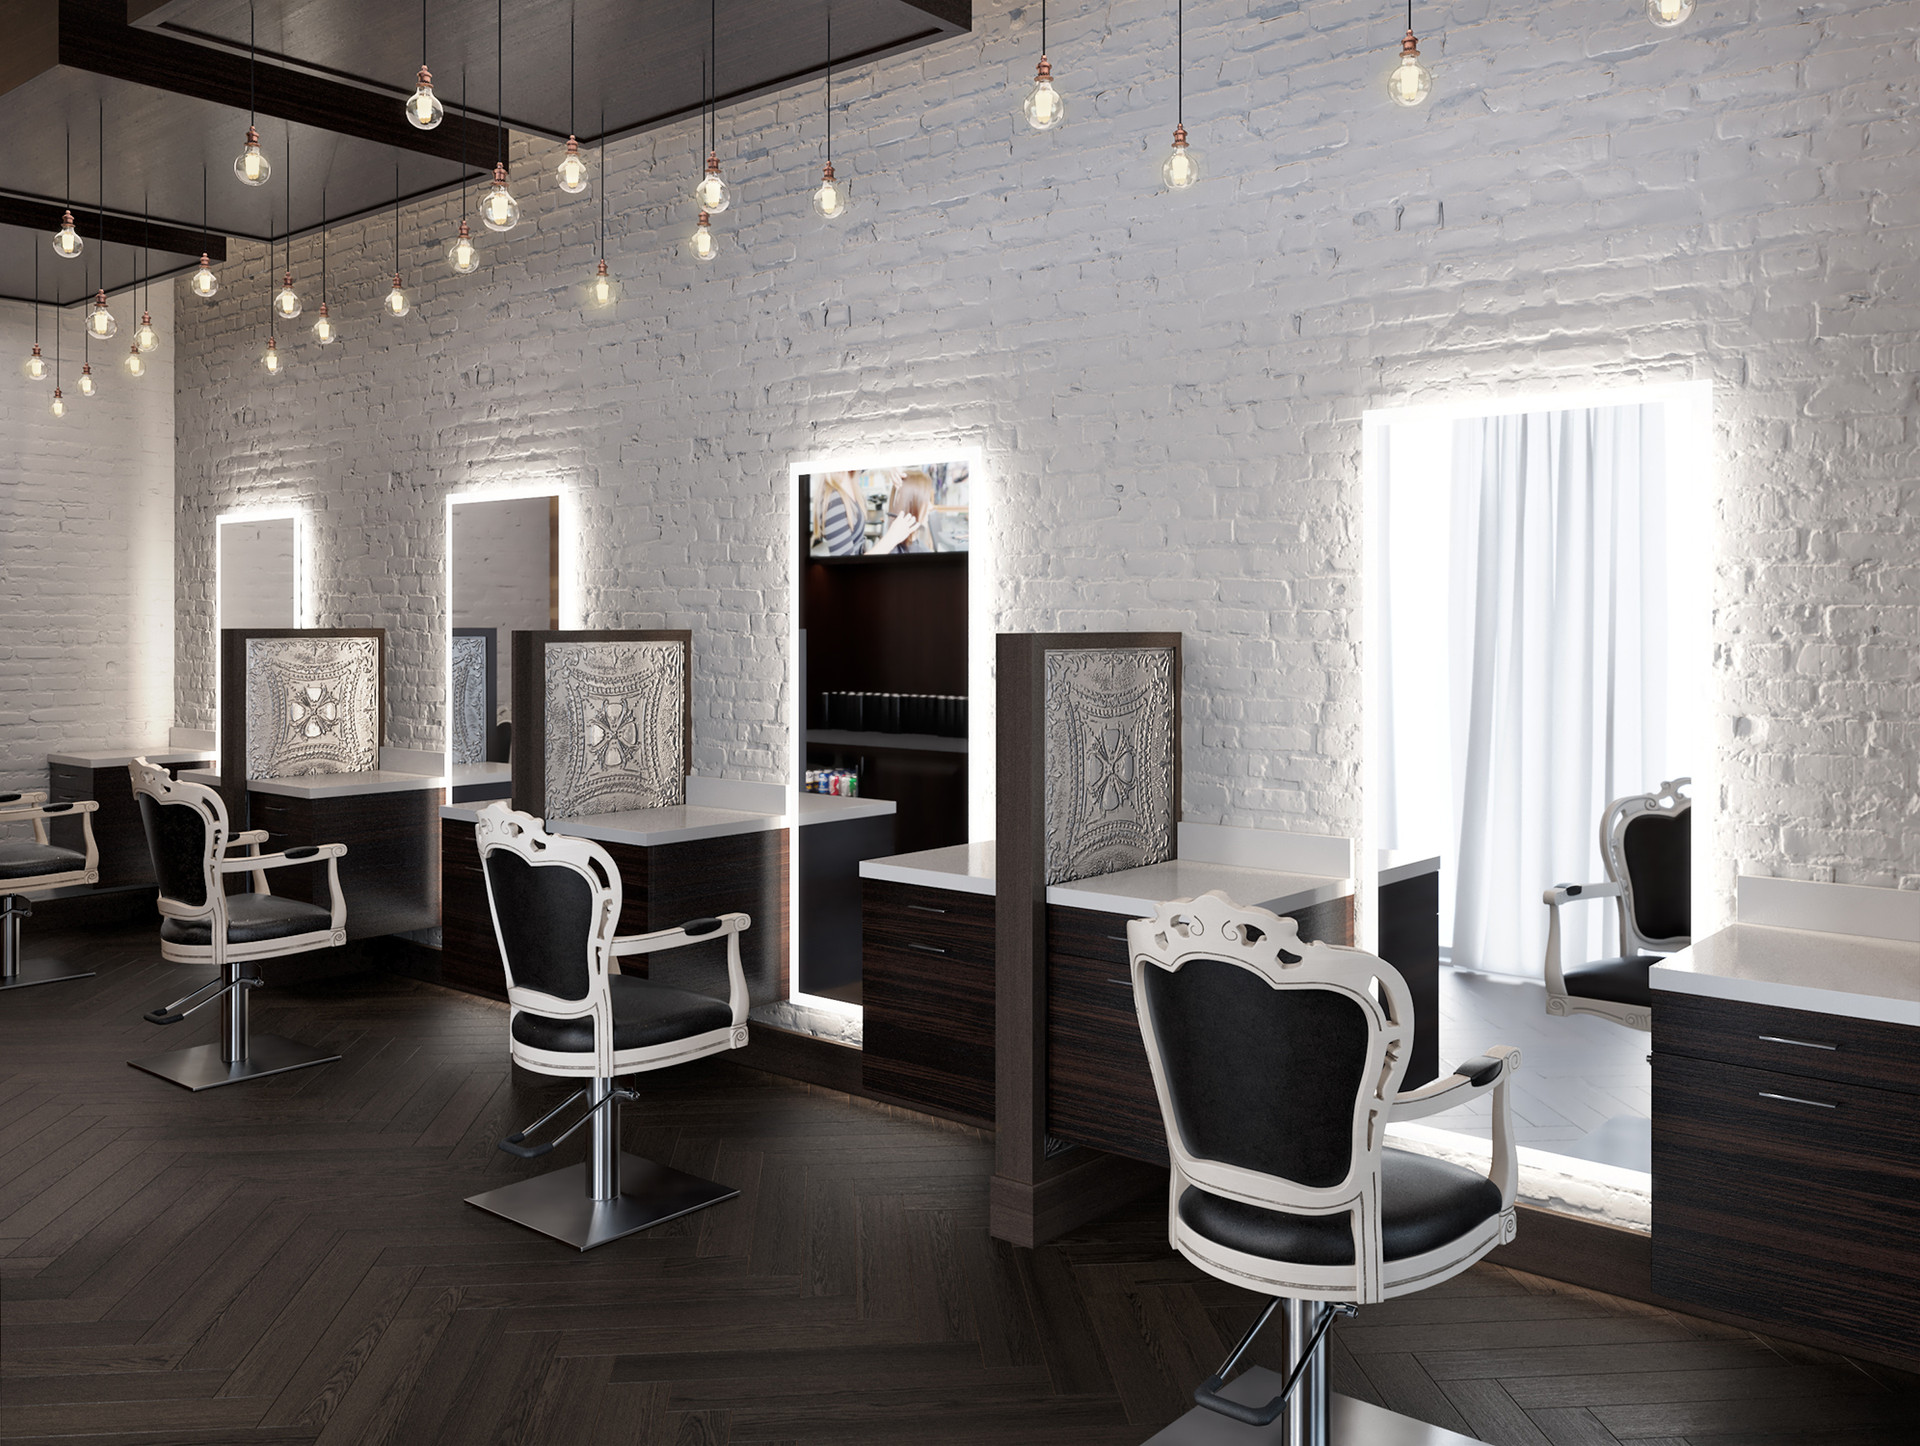 Salon 4 copy.jpg